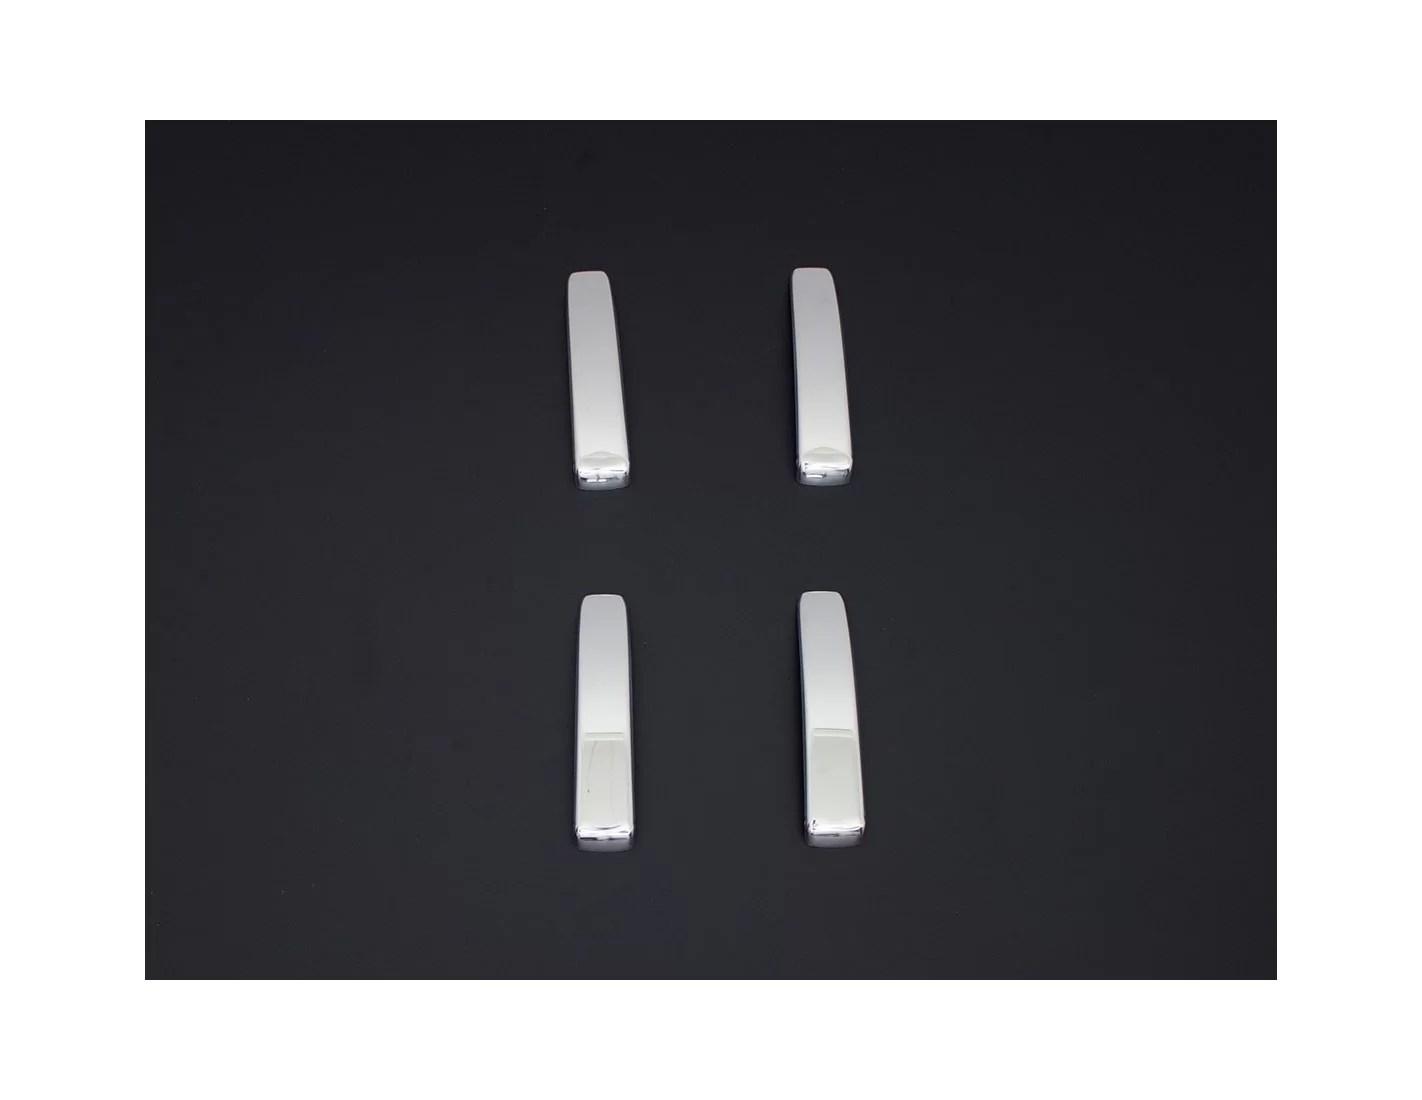 KIA Optima 2009-2010 Basic Set, Manual Gearbox AC Interior